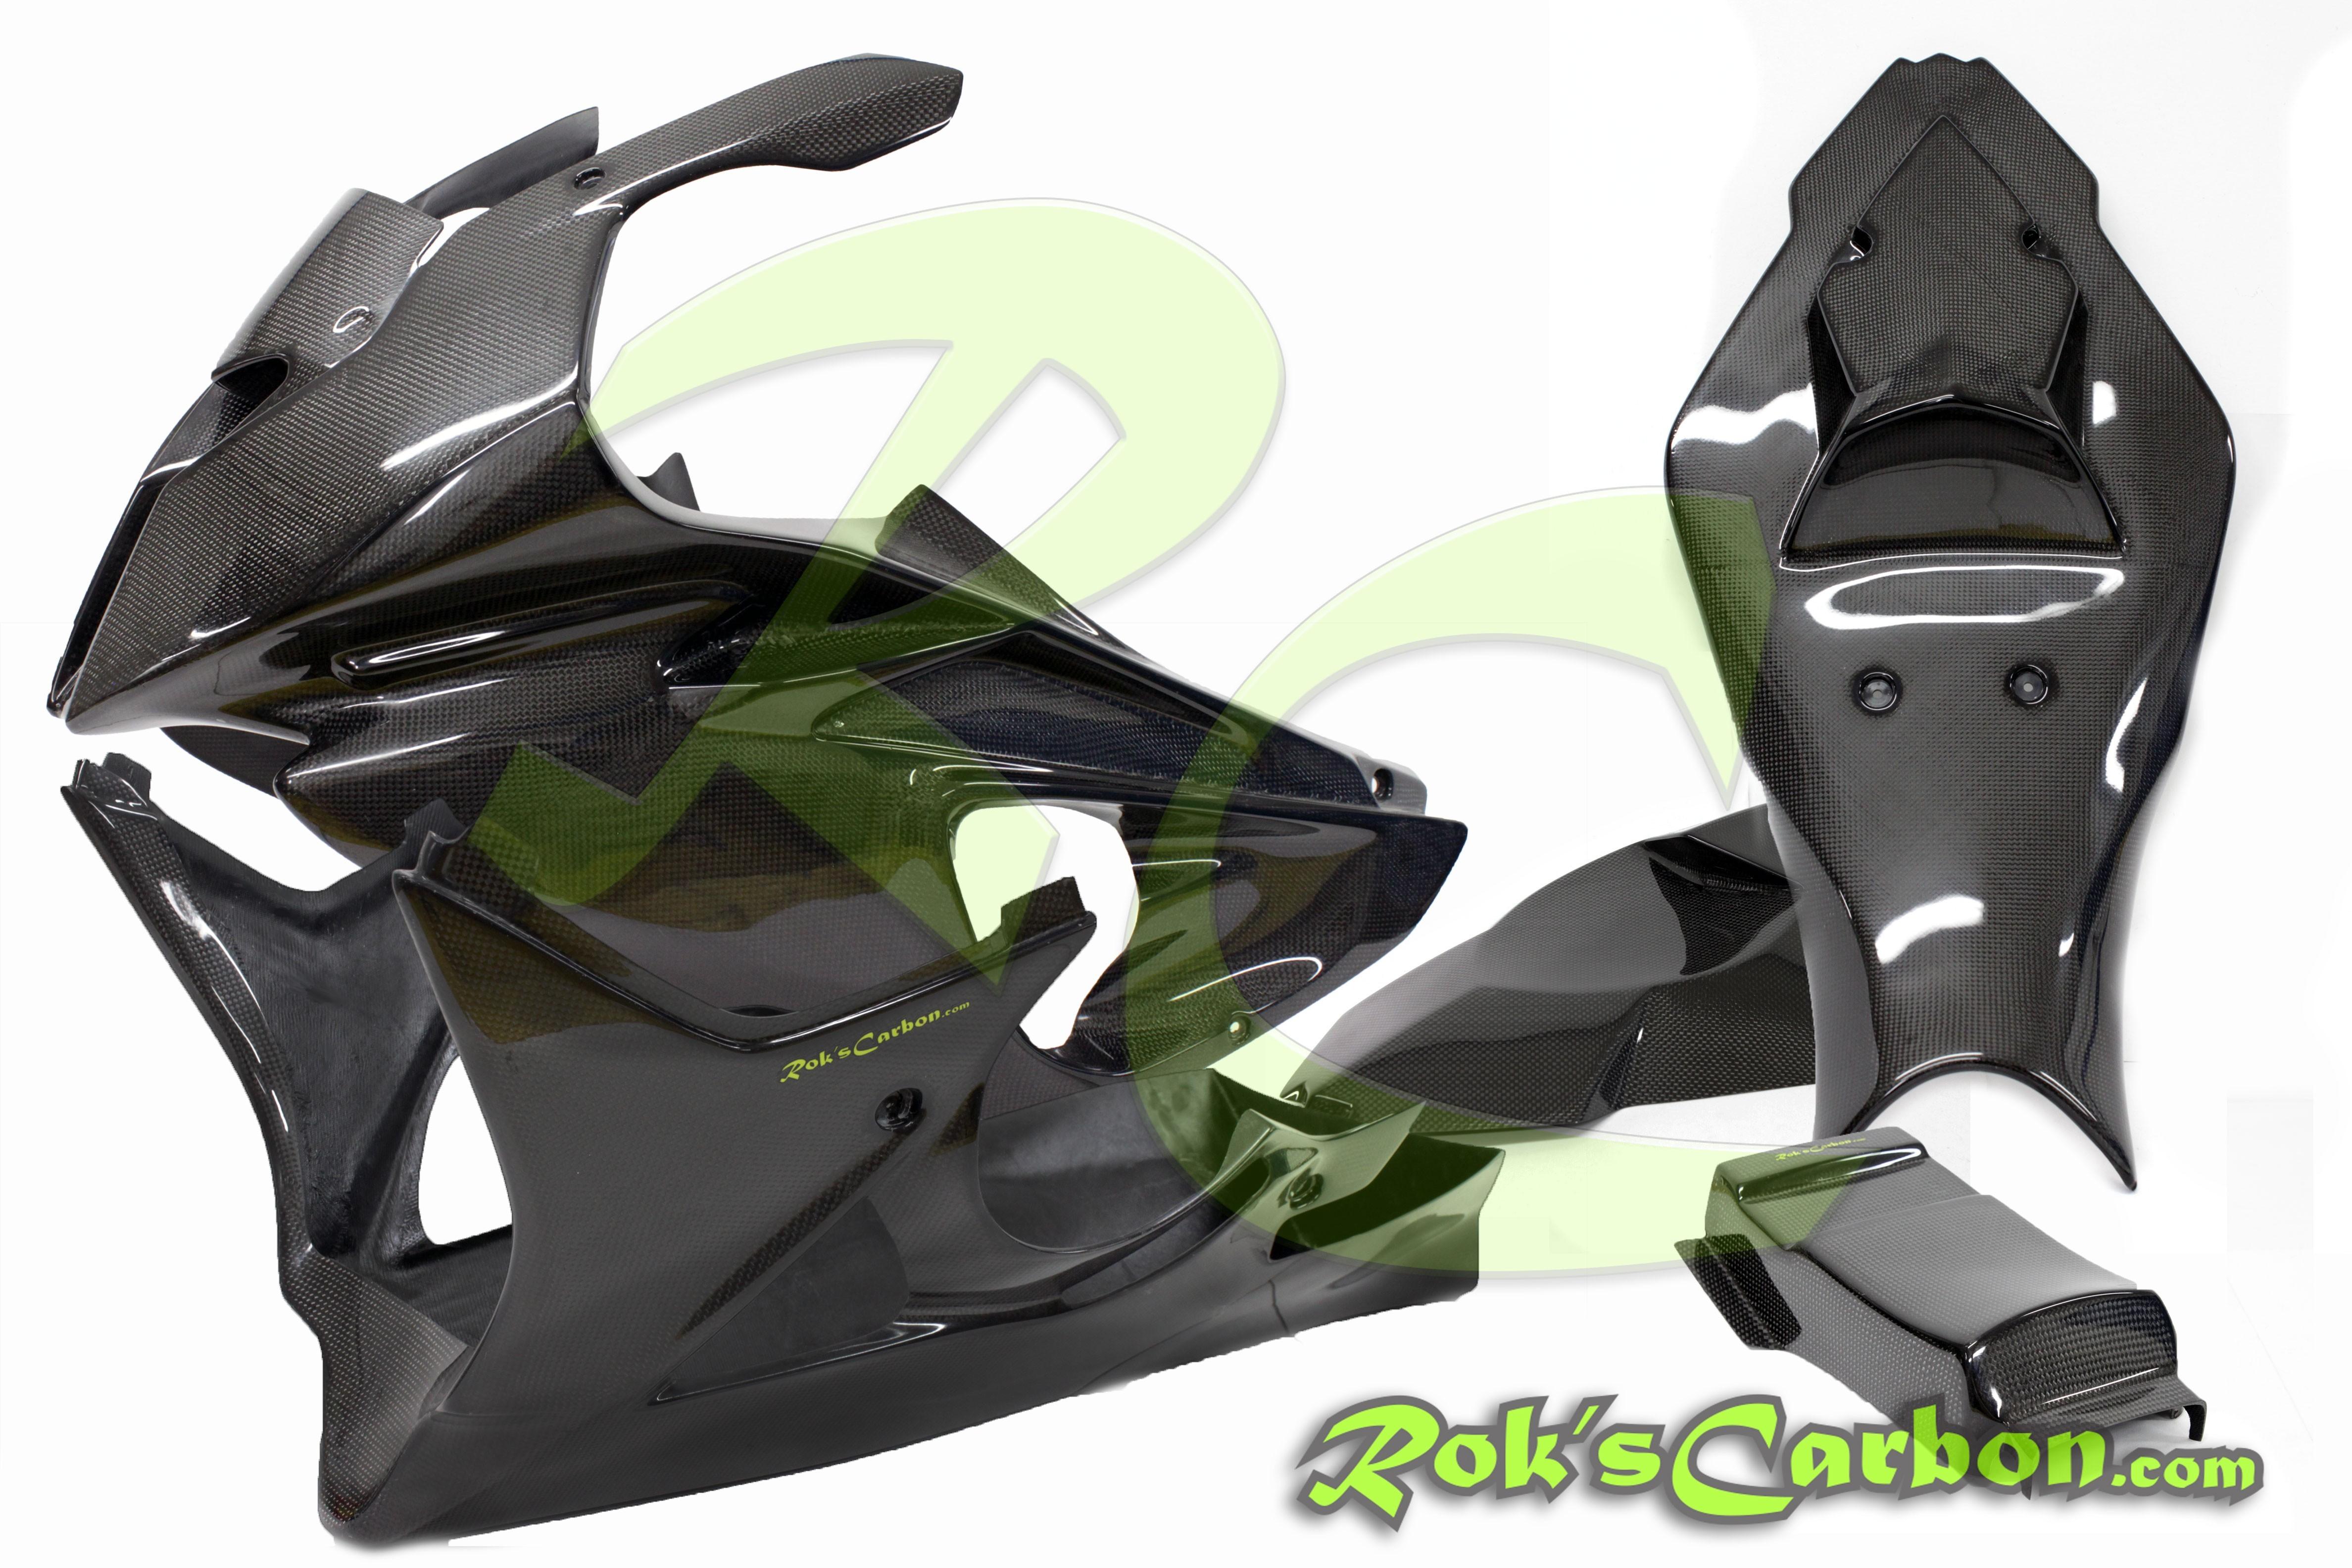 2009 2014 Bmw S1000rr Plain Hp4 Carbon Fiber Racing Belly Pan